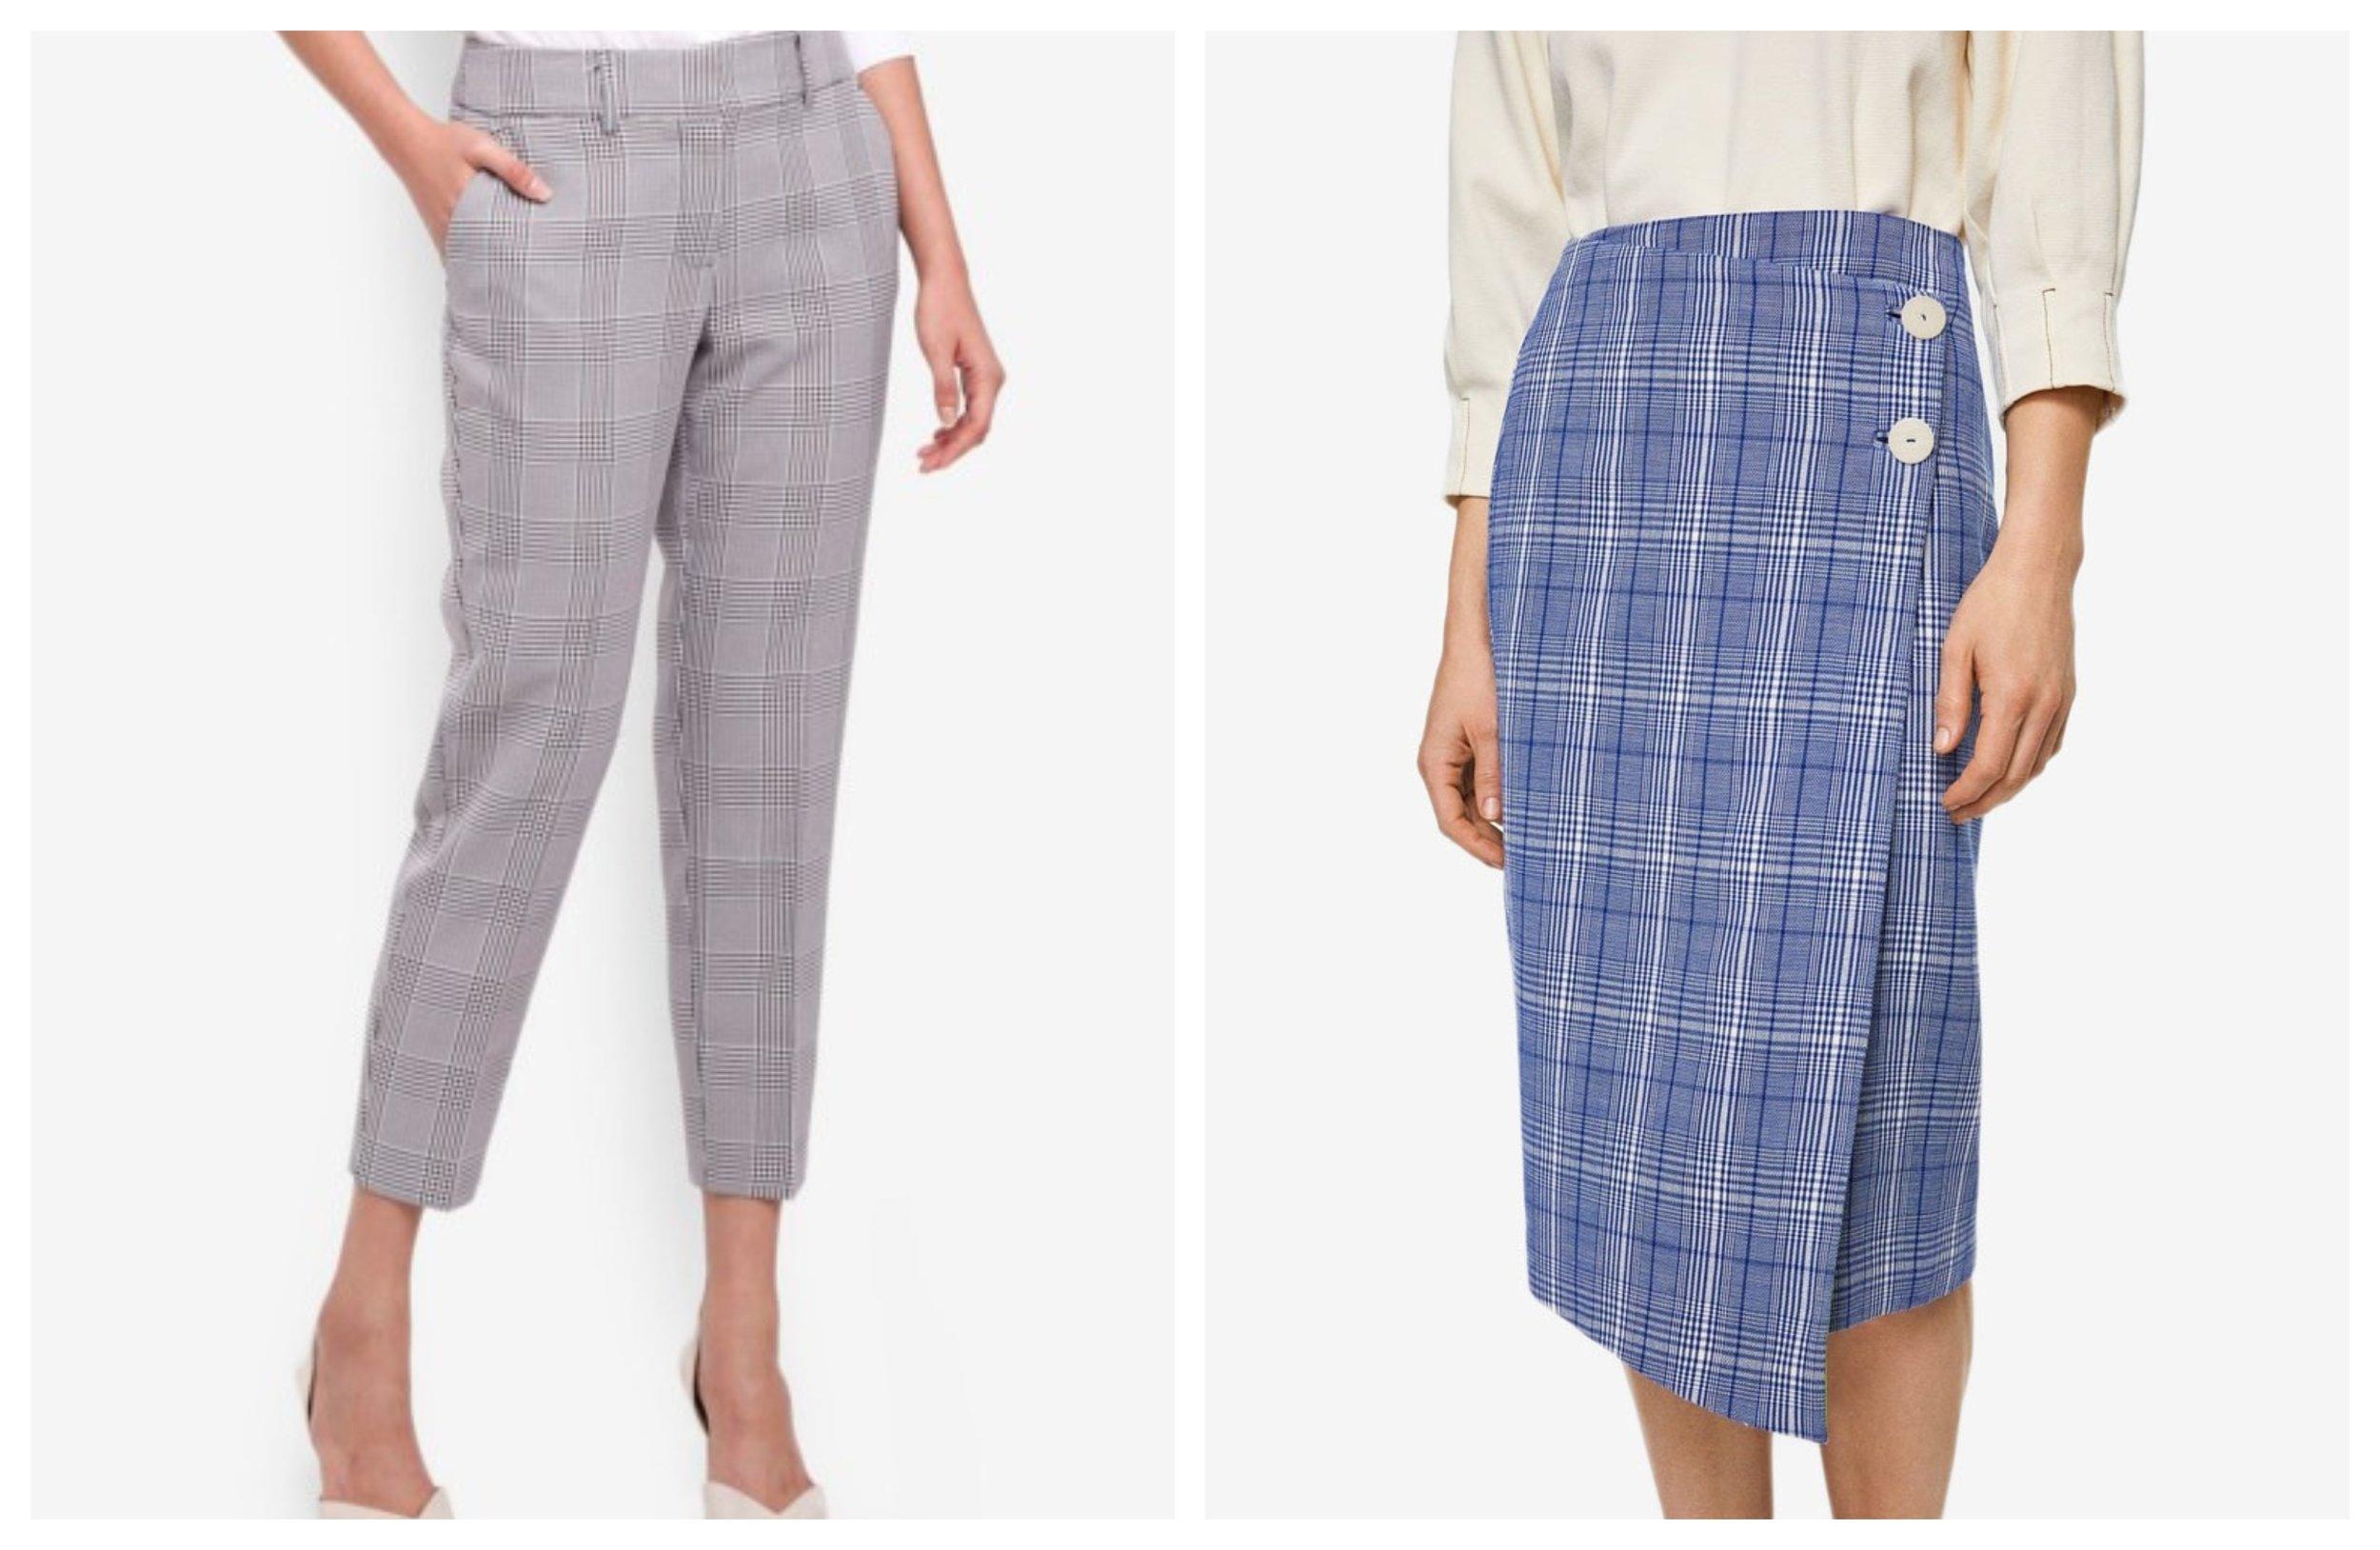 Dorothy Perkins Black/Port Check Ankle Grazer Pants  I  Mango Check Wrap Skirt